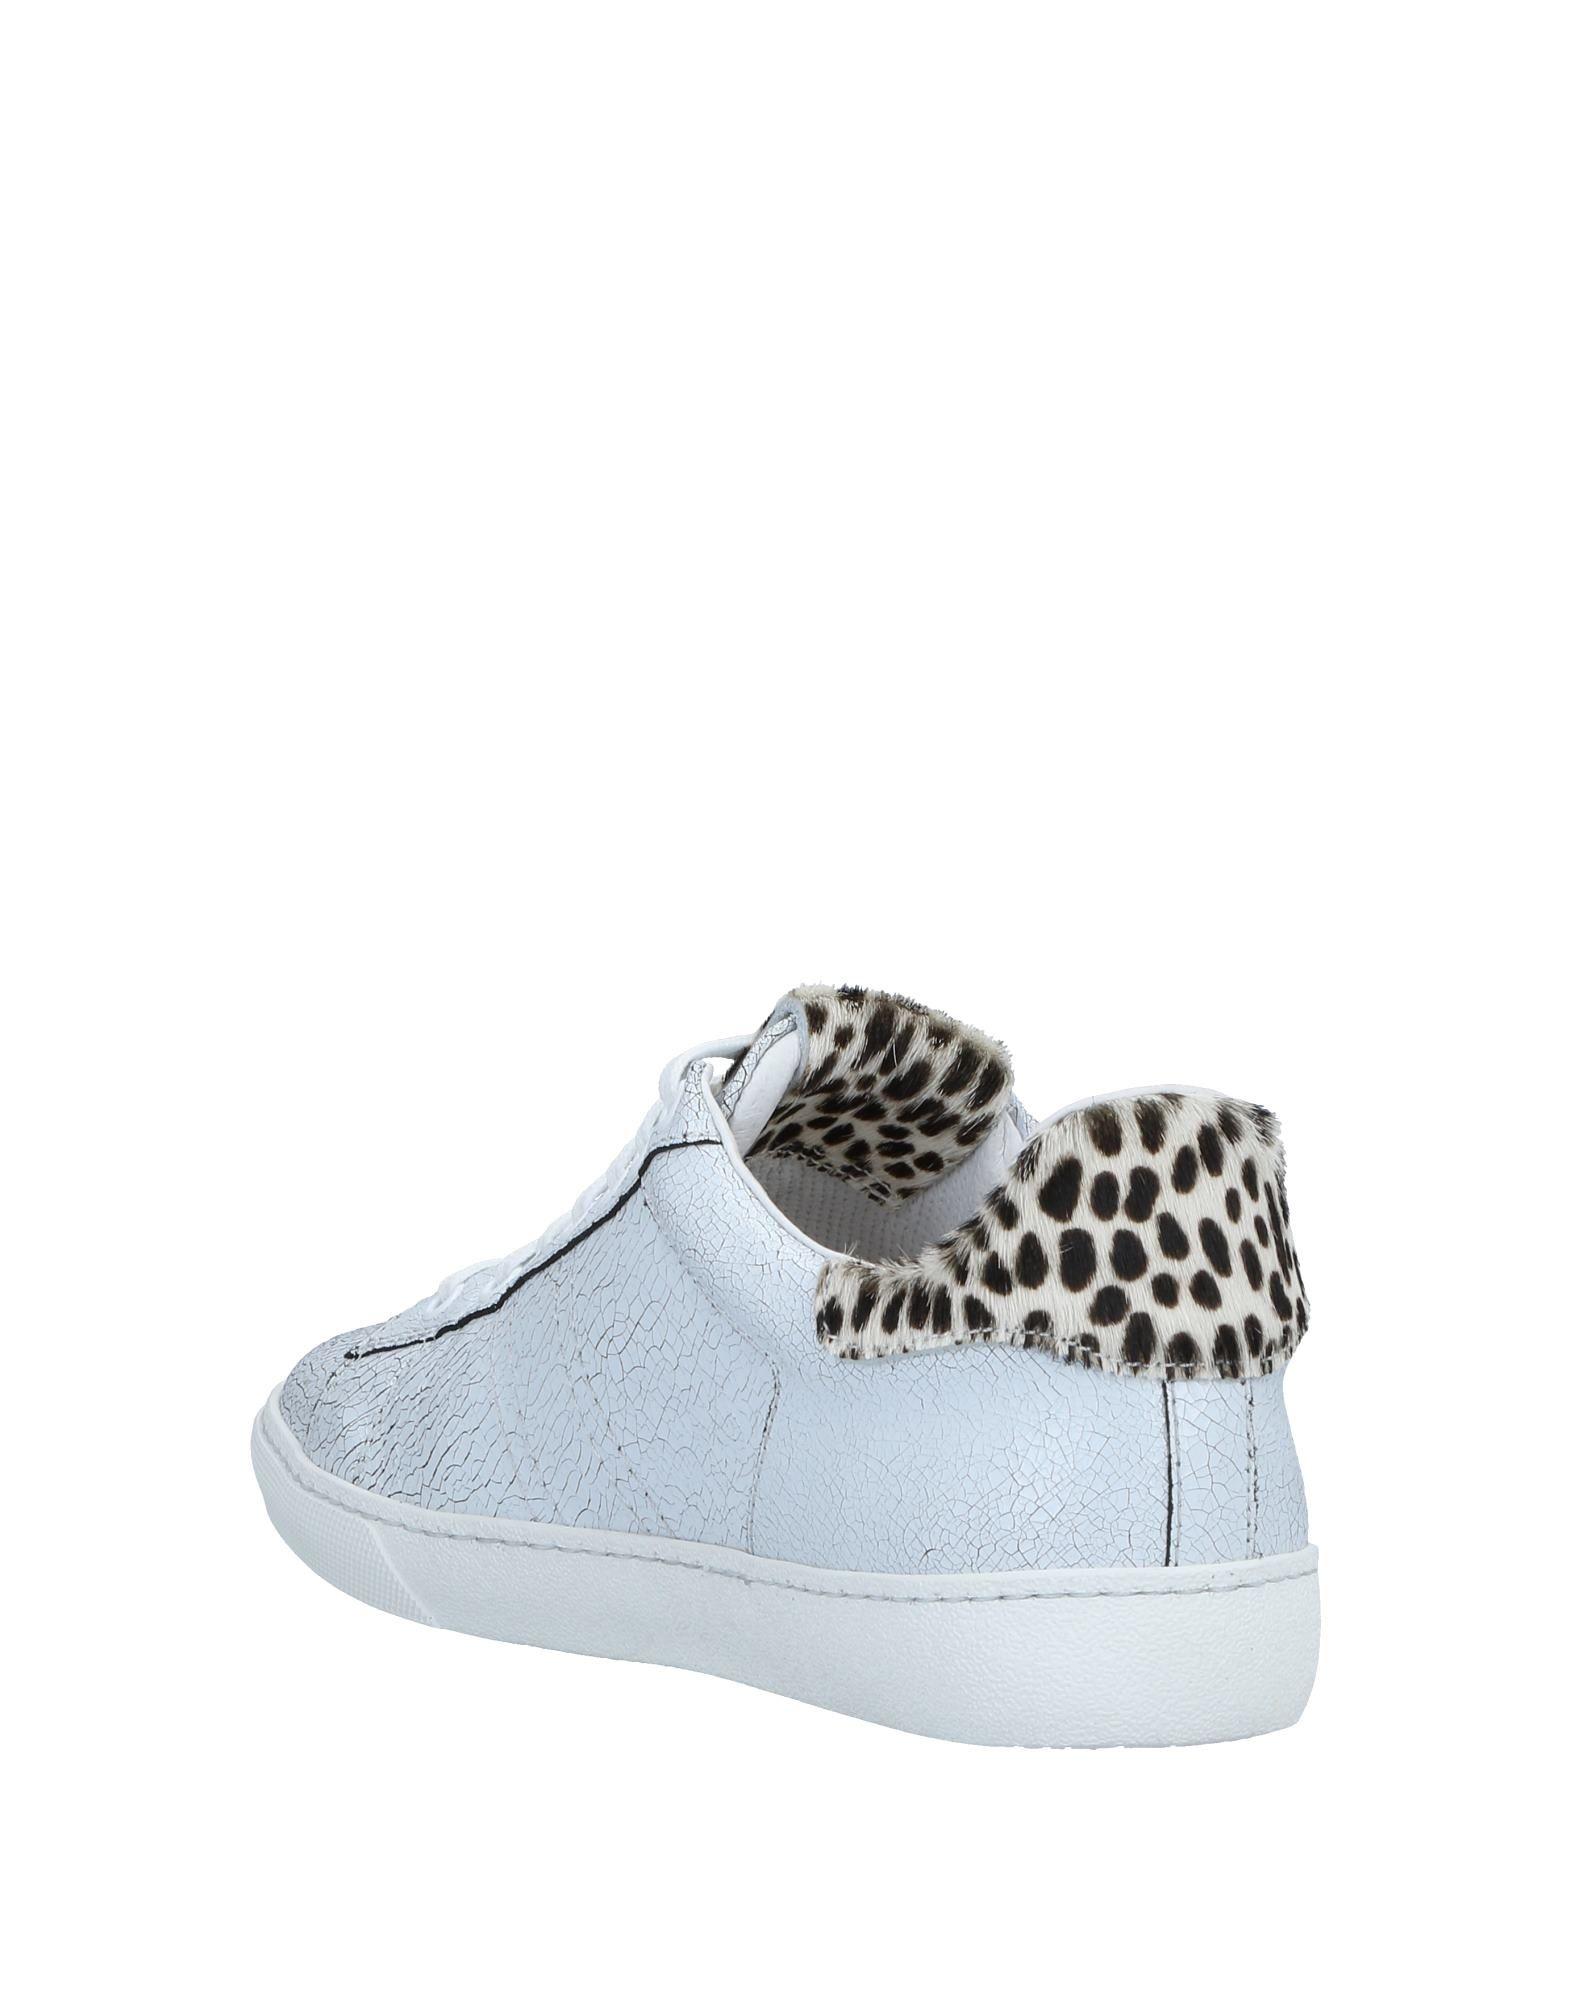 Stokton Sneakers Qualität Damen  11531369QS Gute Qualität Sneakers beliebte Schuhe e2ea2a